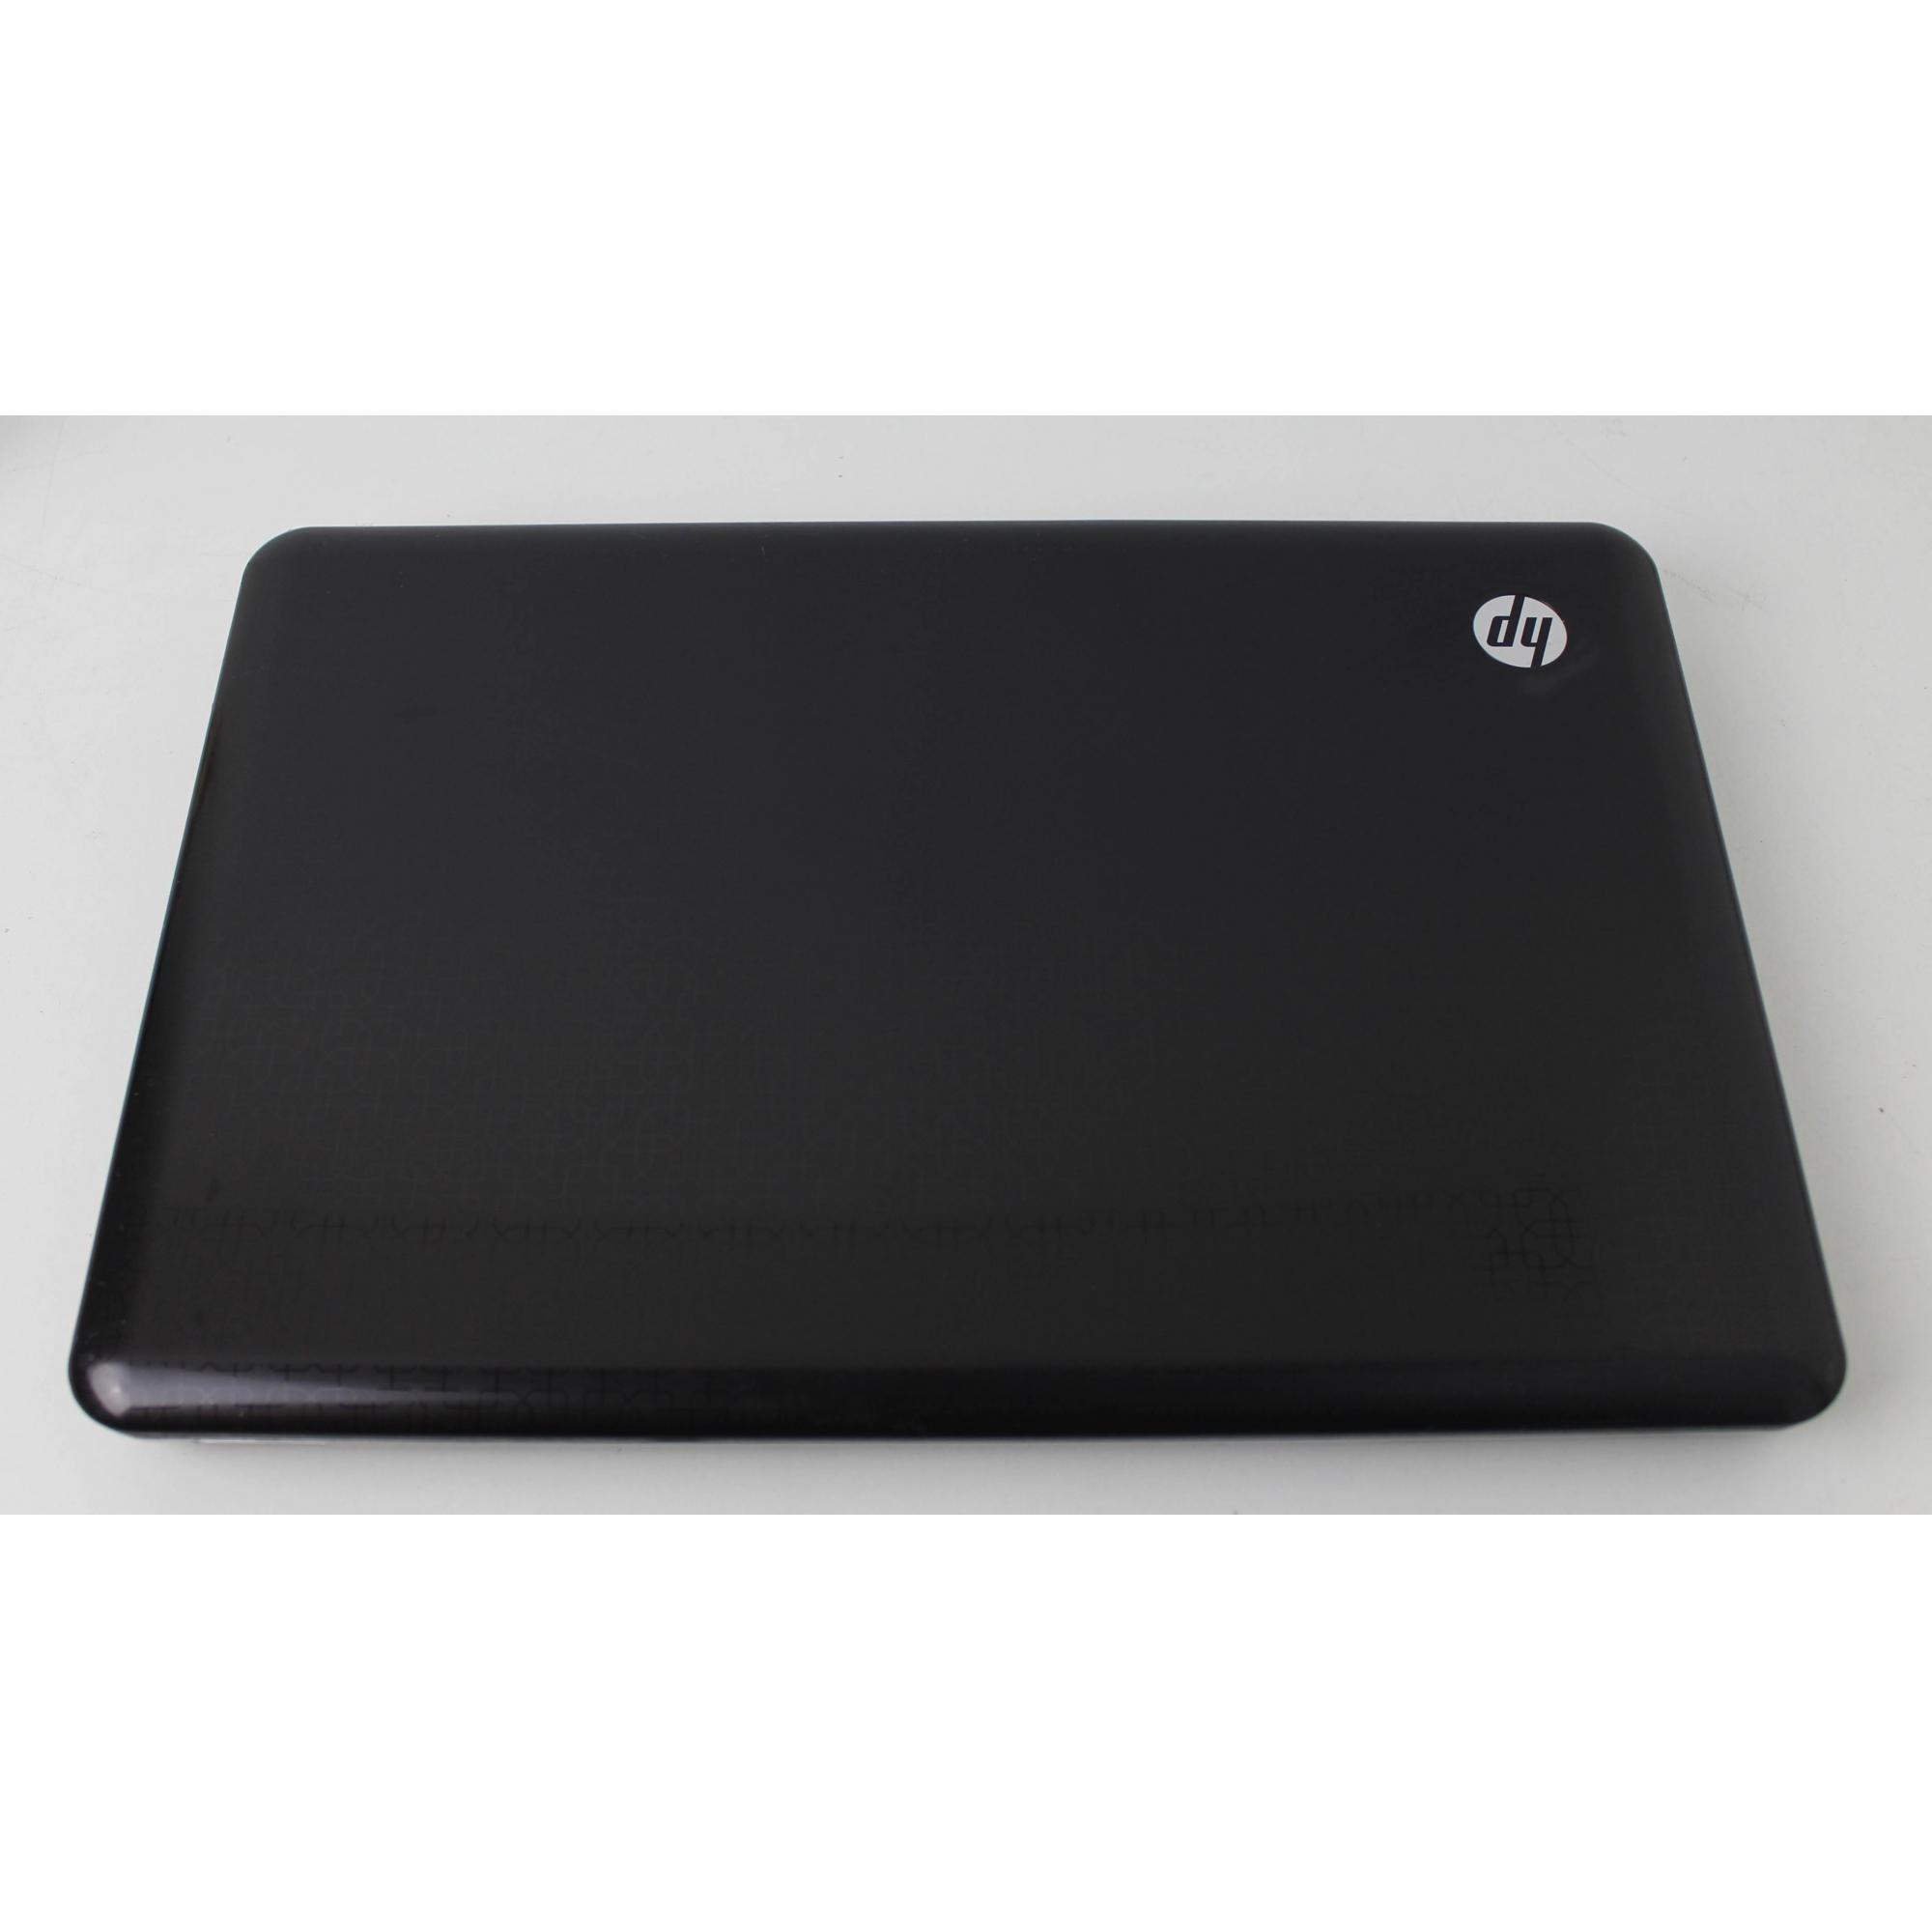 NOTEBOOK HP PAVILION DV5 INTEL CORE I3 2.27GHZ 4GB HD-500GB